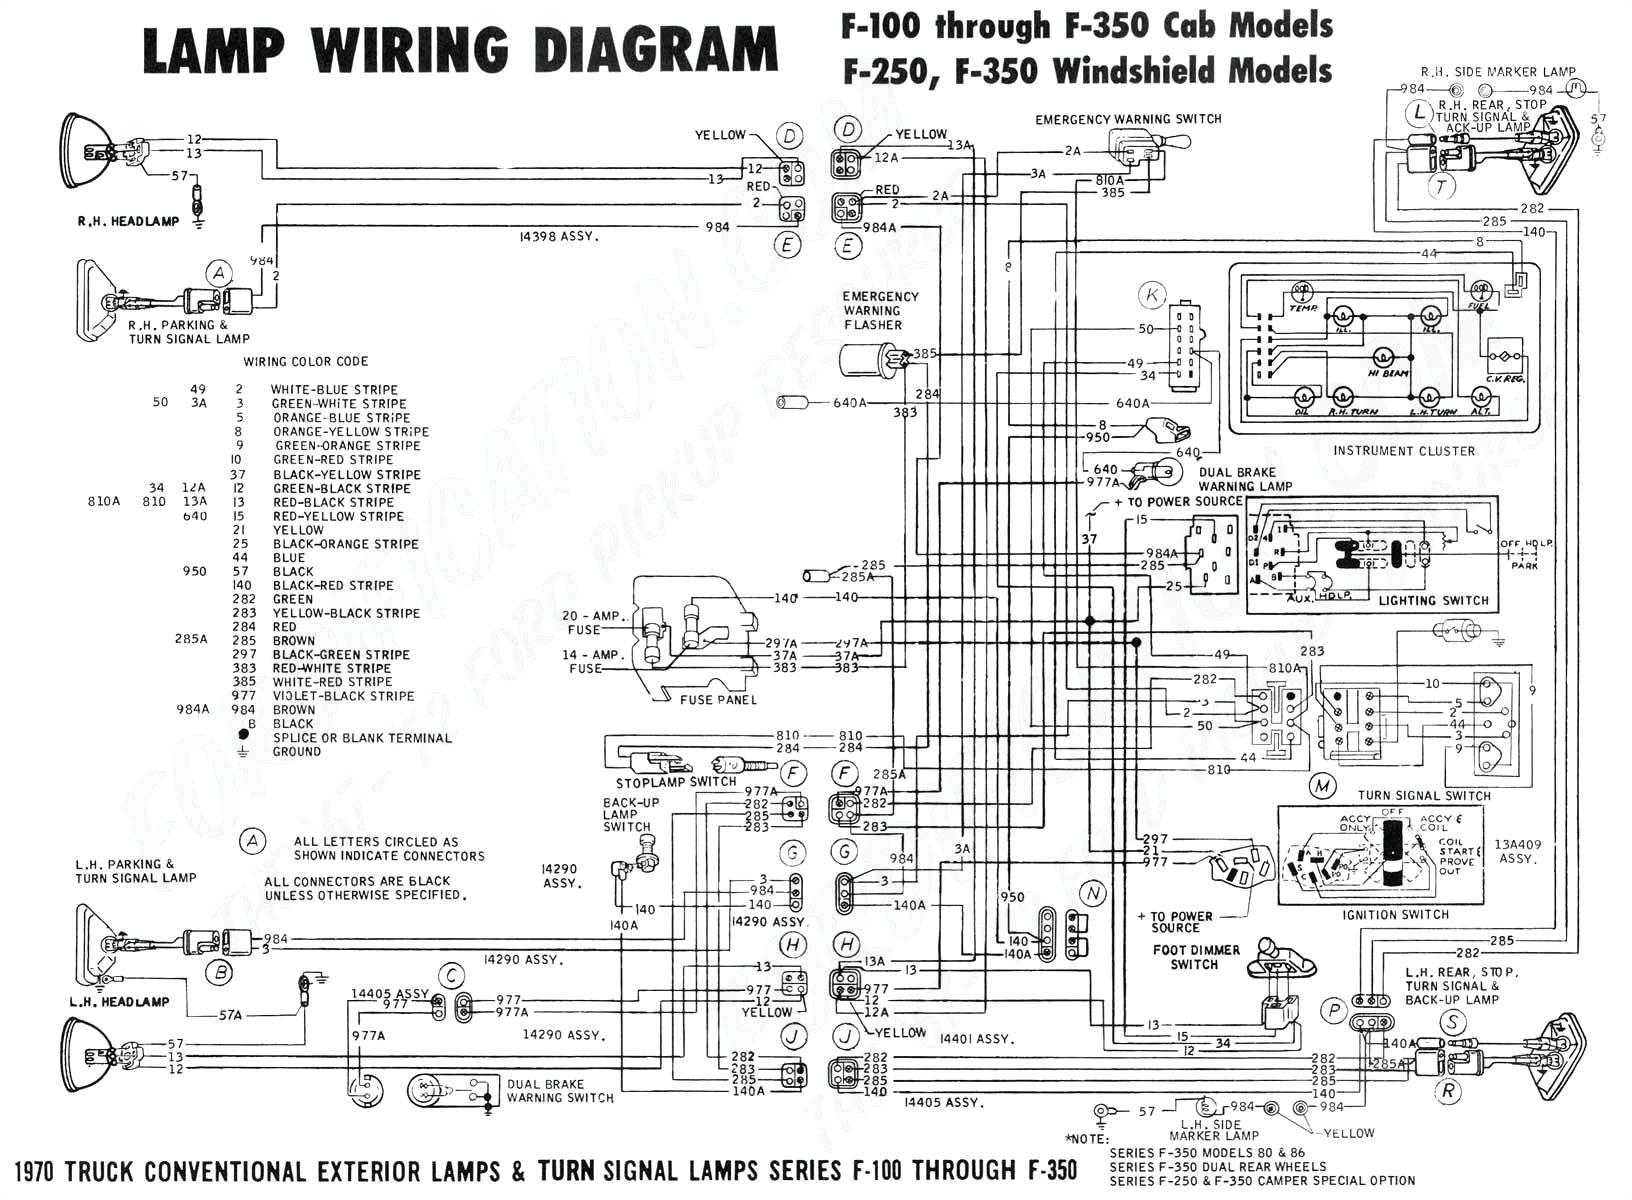 2015 Acadia Trailer Wiring Pinout - 1989 Ford Taurus Fuse Box Diagram -  autostereo.yenpancane.jeanjaures37.fr | 2015 Acadia Trailer Wiring Diagram |  | Wiring Diagram Resource